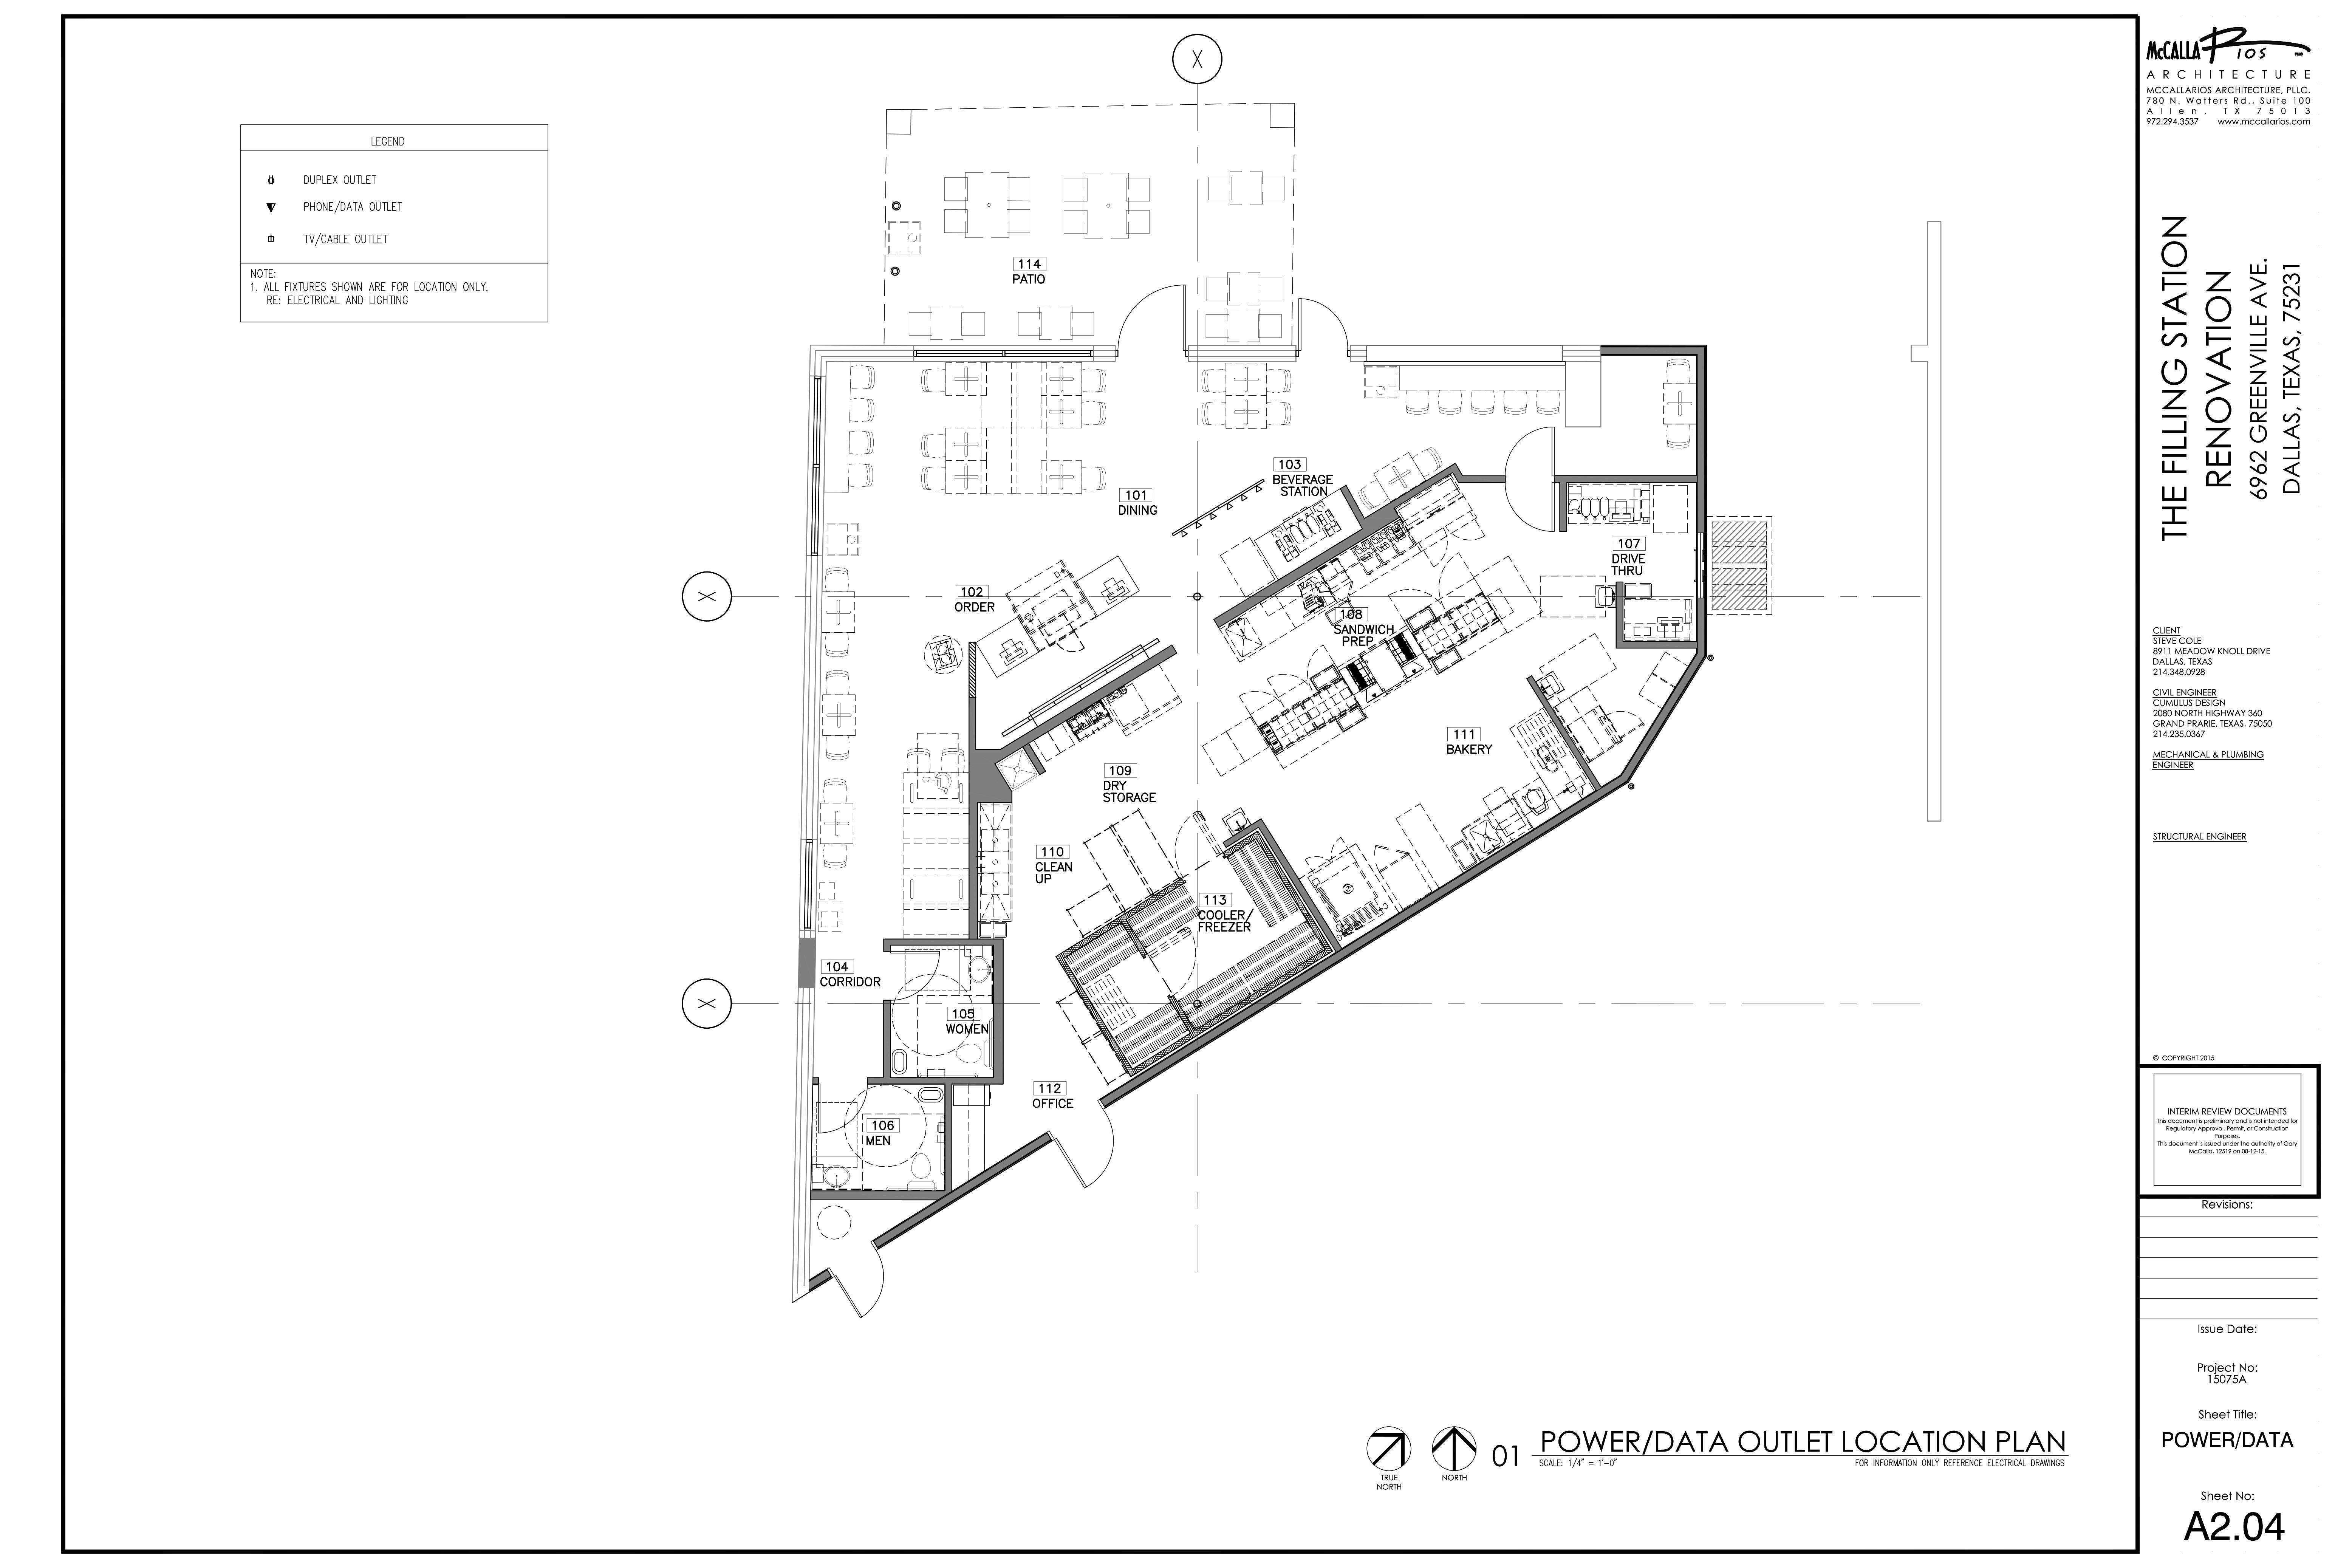 6862 Greenville Ave - Schlotzsky's Deli: site plan